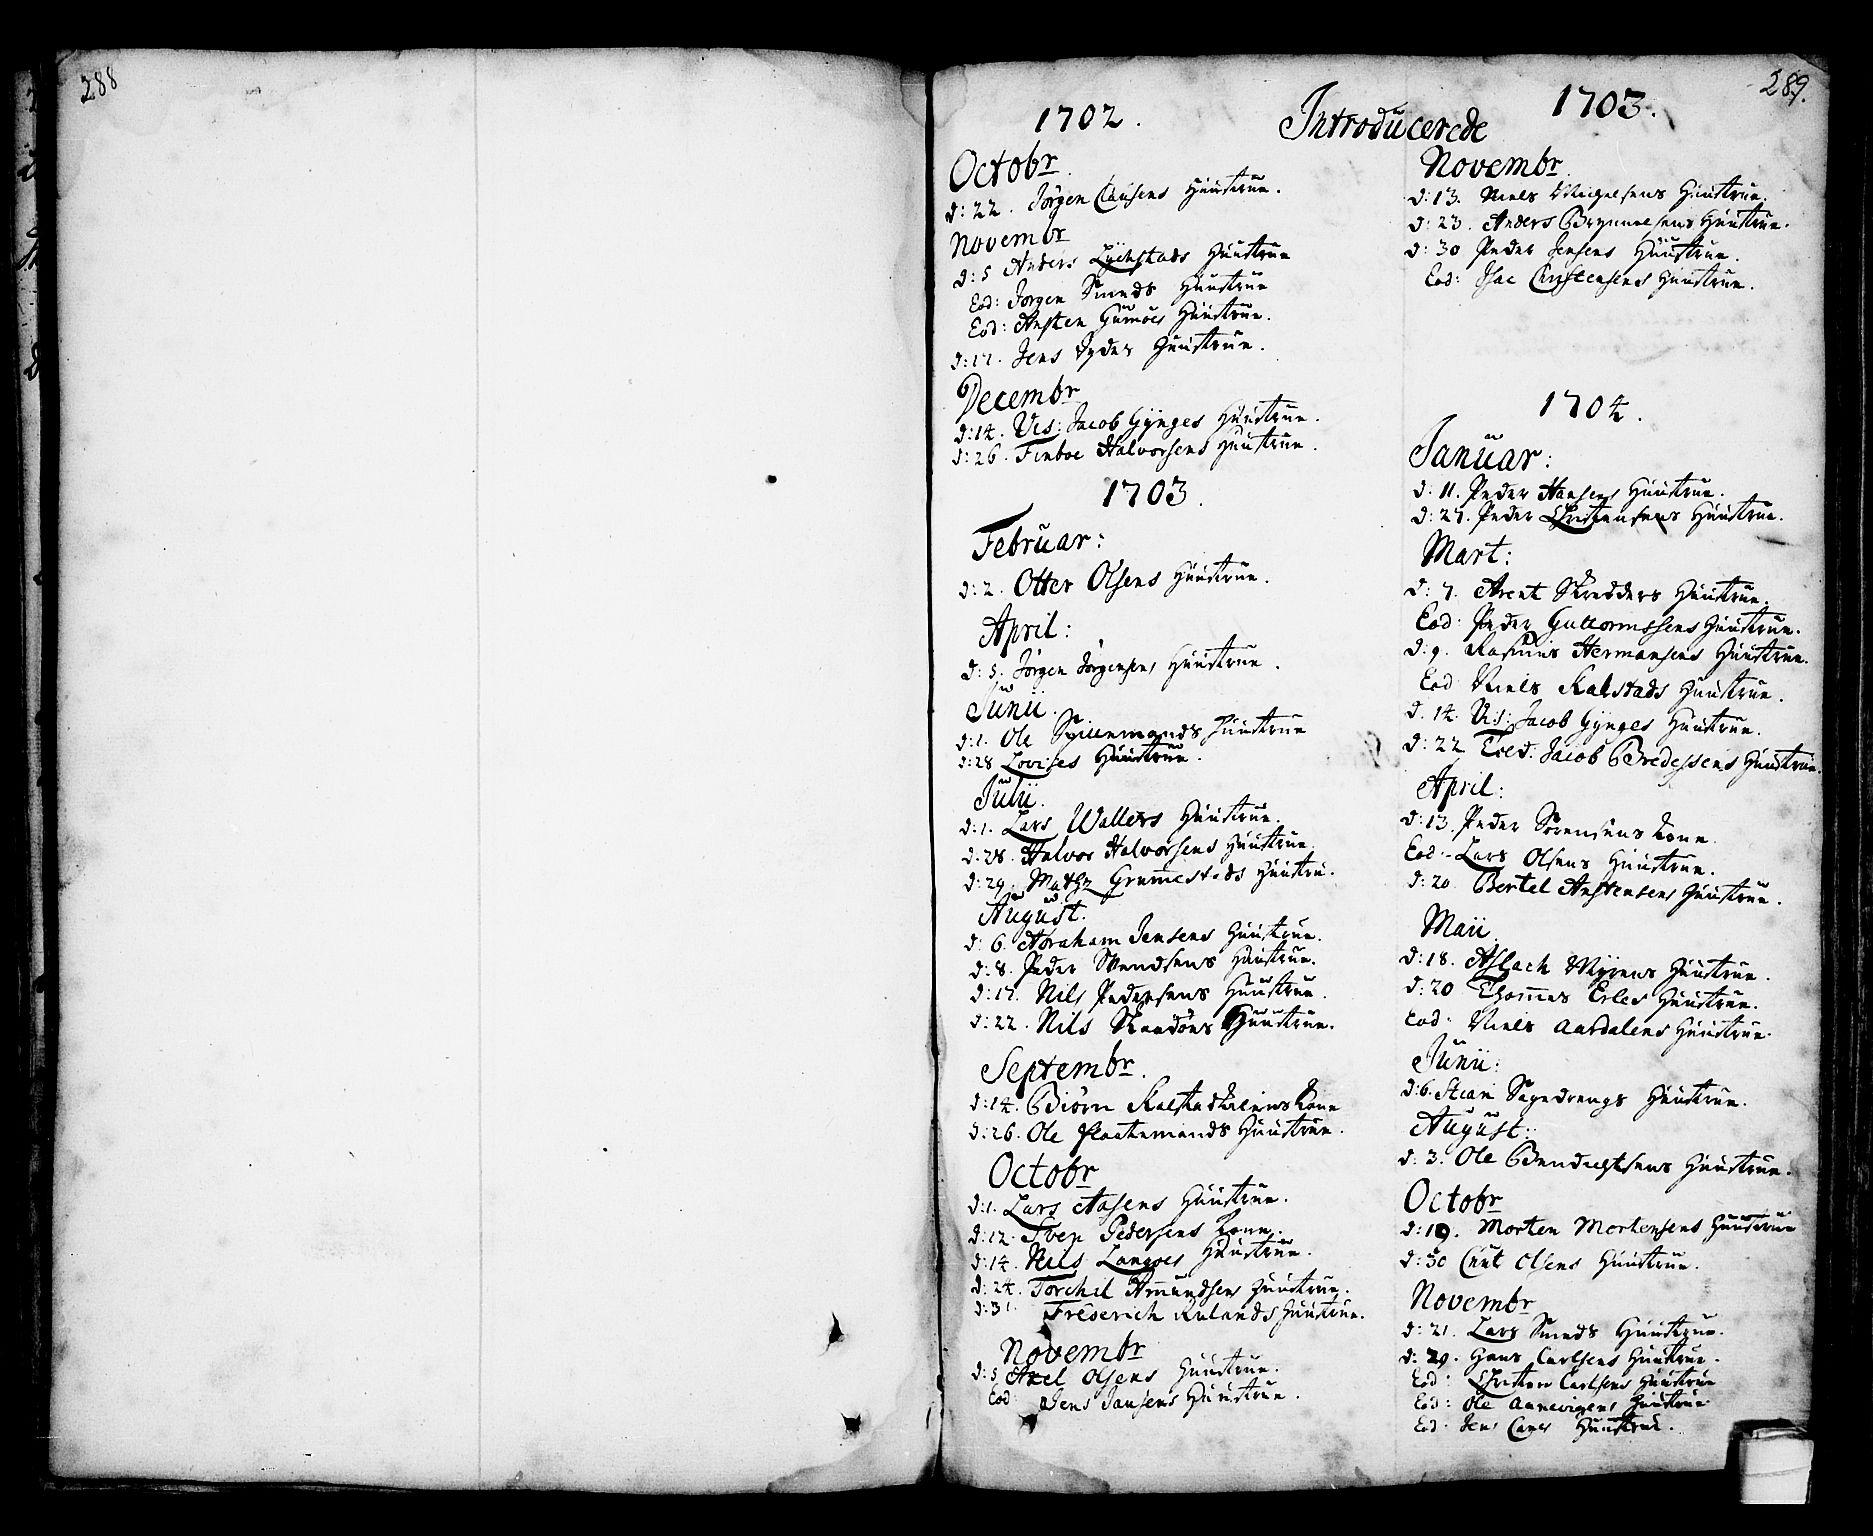 SAKO, Kragerø kirkebøker, F/Fa/L0001: Ministerialbok nr. 1, 1702-1766, s. 288-289